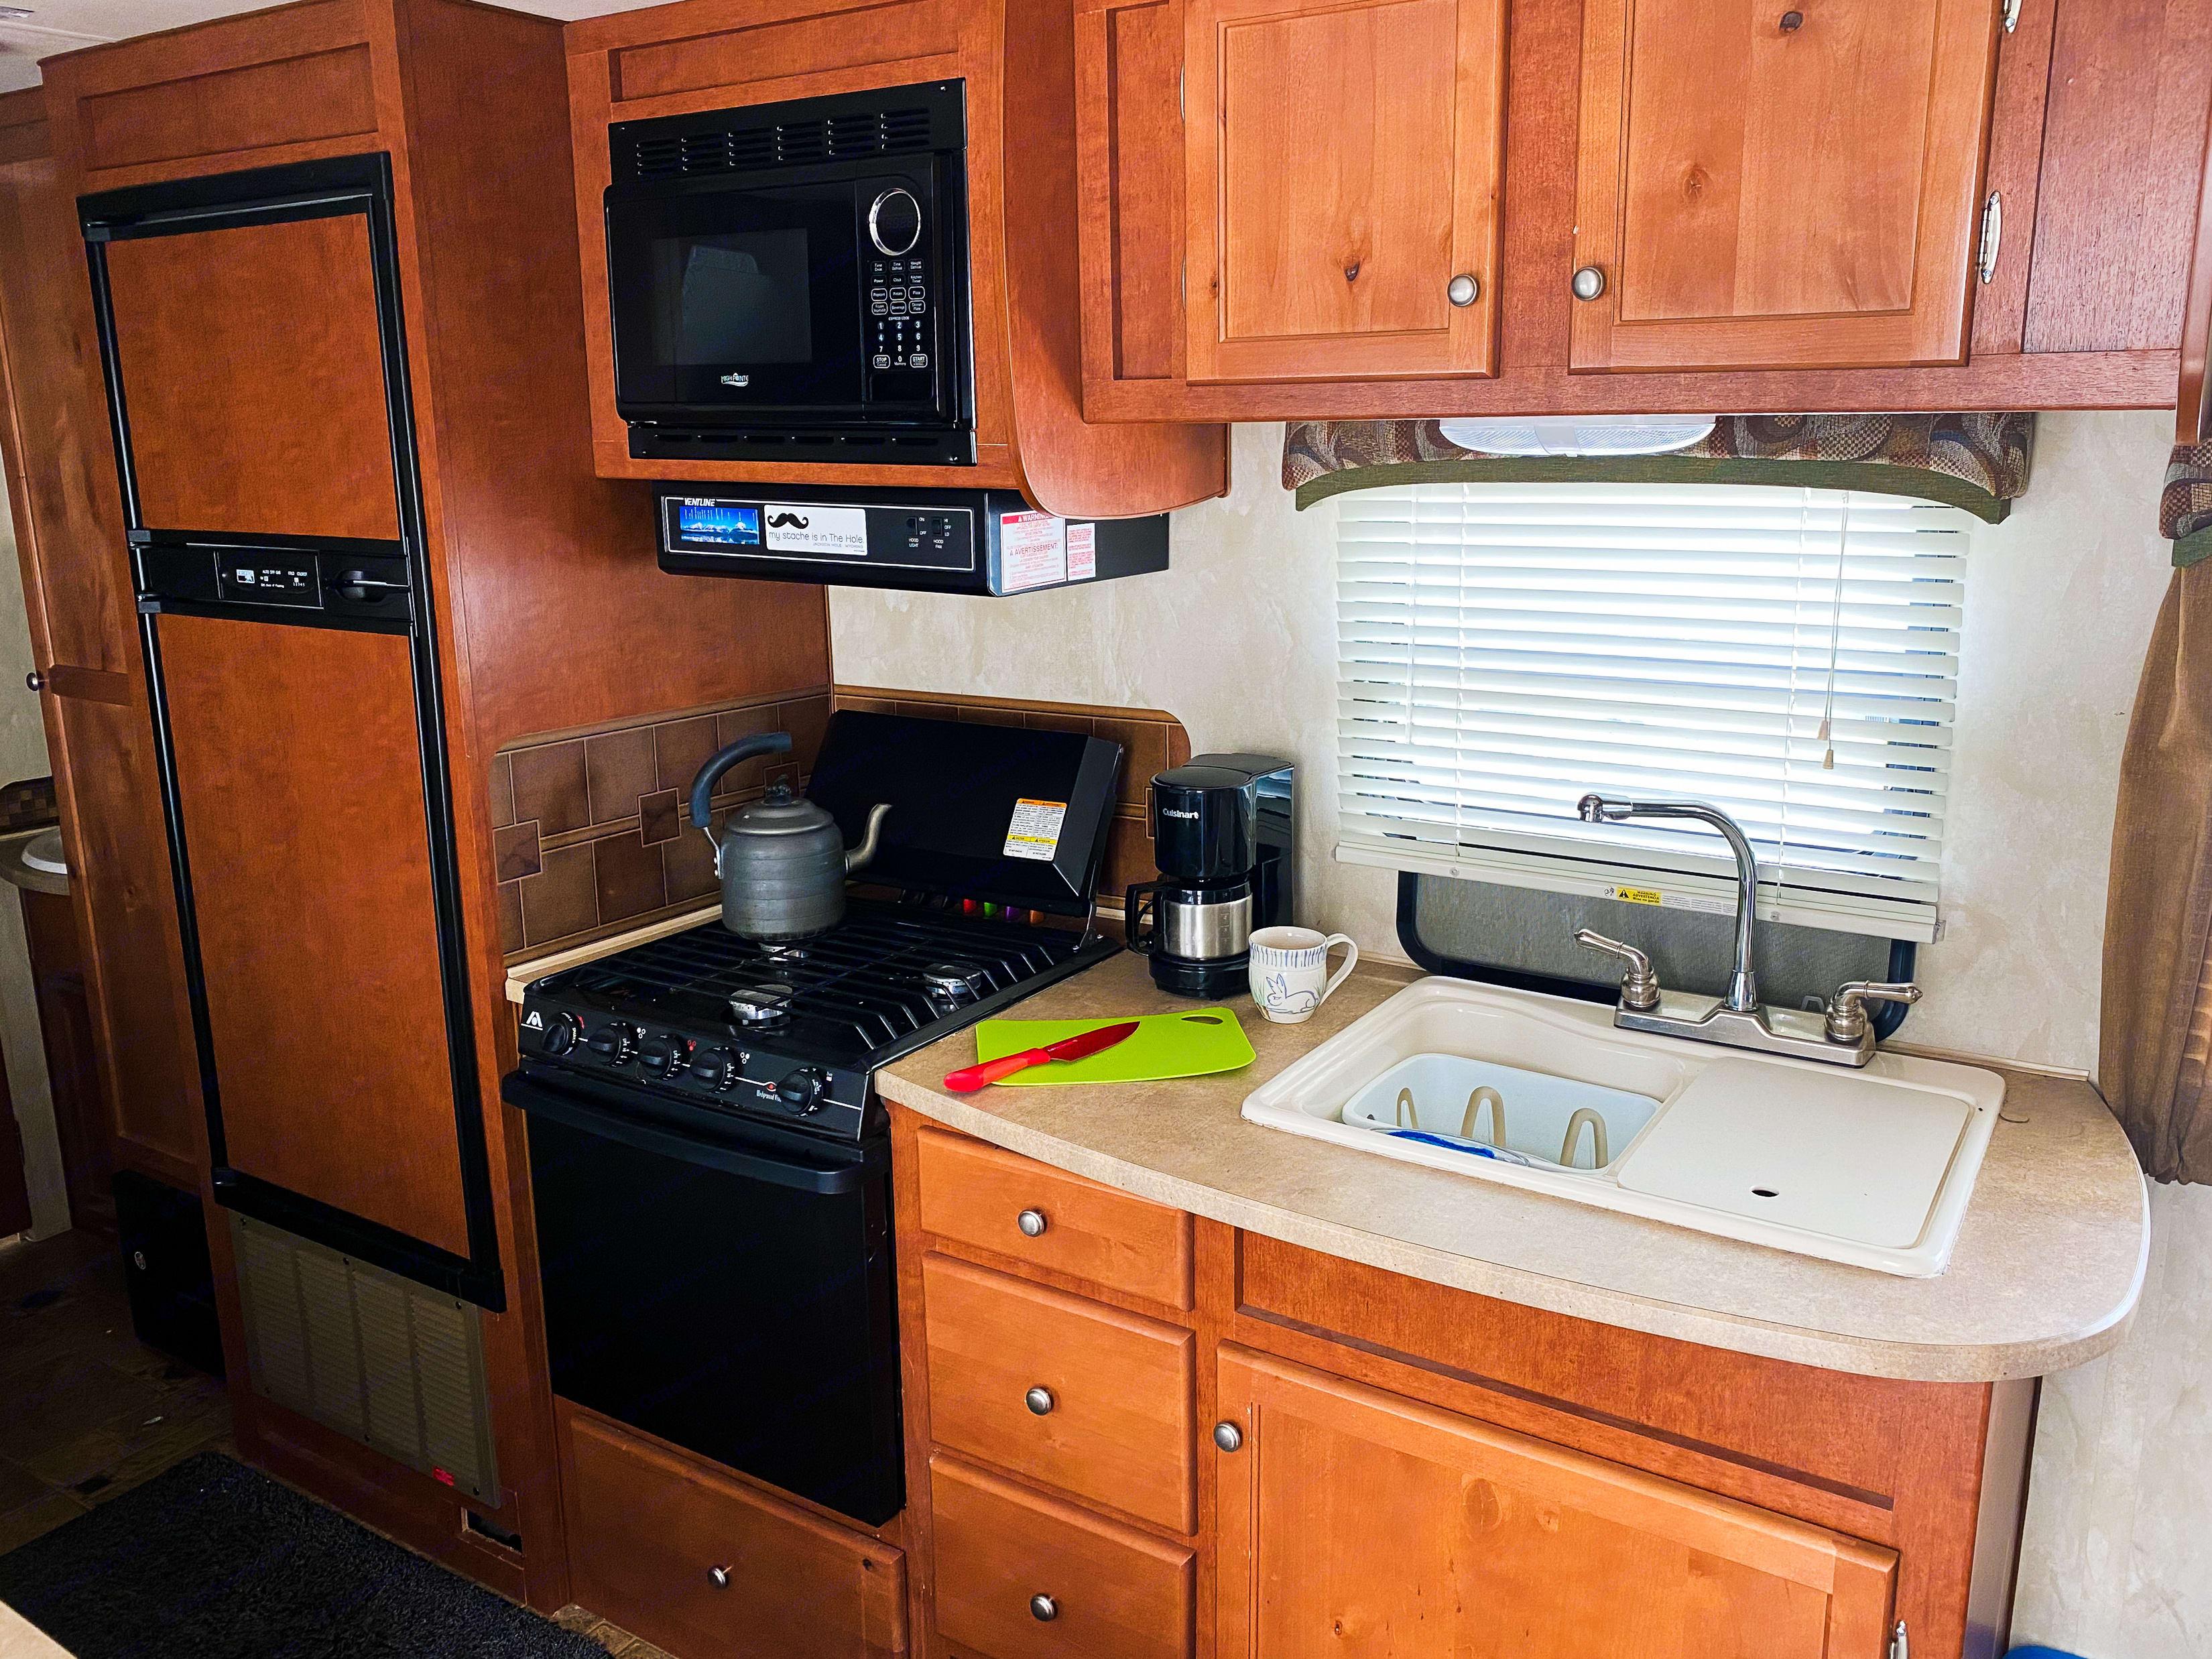 Freezer, Fridge, microwave, stove and double sink.. Northwood Mfg Nash 2013